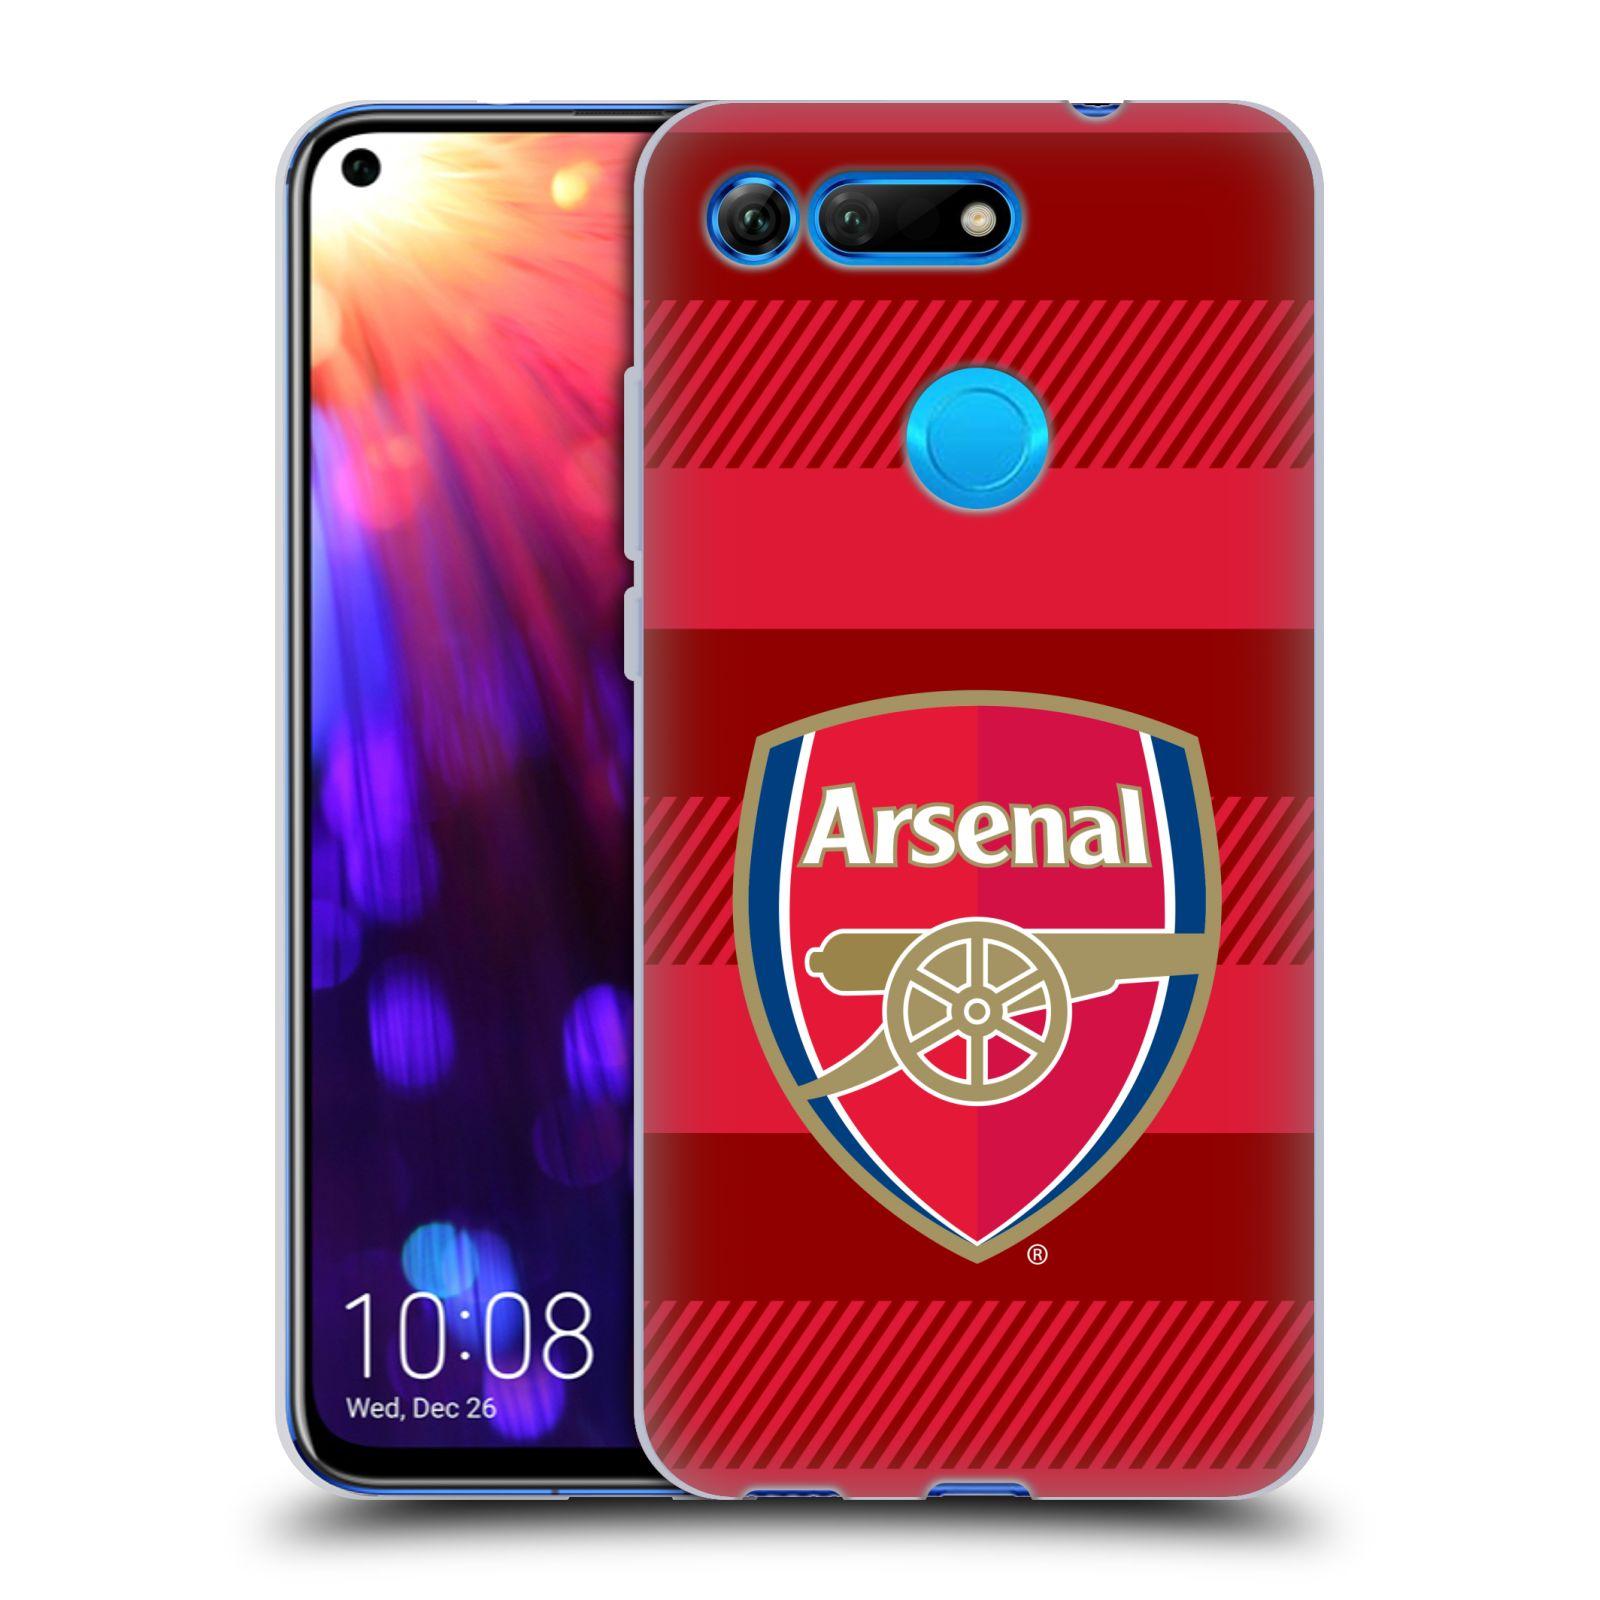 Silikonové pouzdro na mobil Honor View 20 - Head Case - Arsenal FC - Logo s pruhy